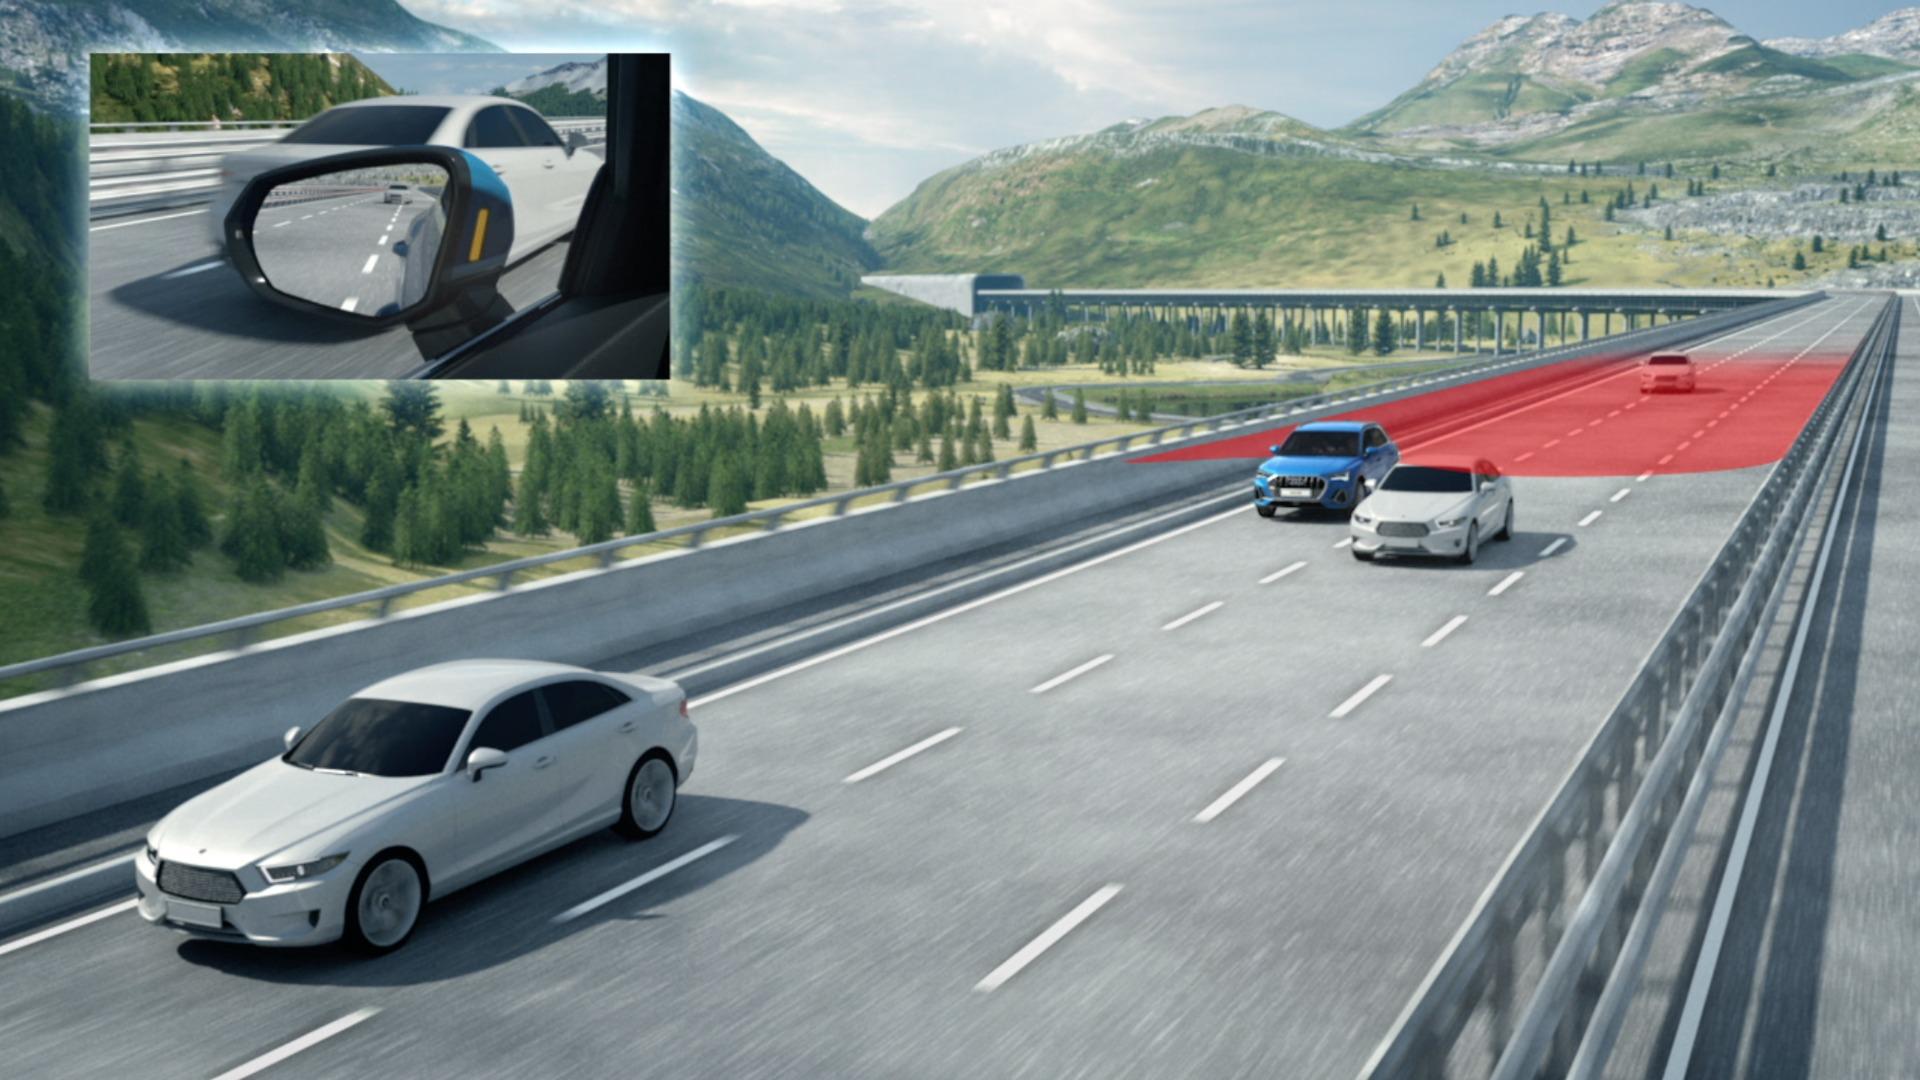 Fahrerassistenzsysteme im Audi Q3 (Animation)